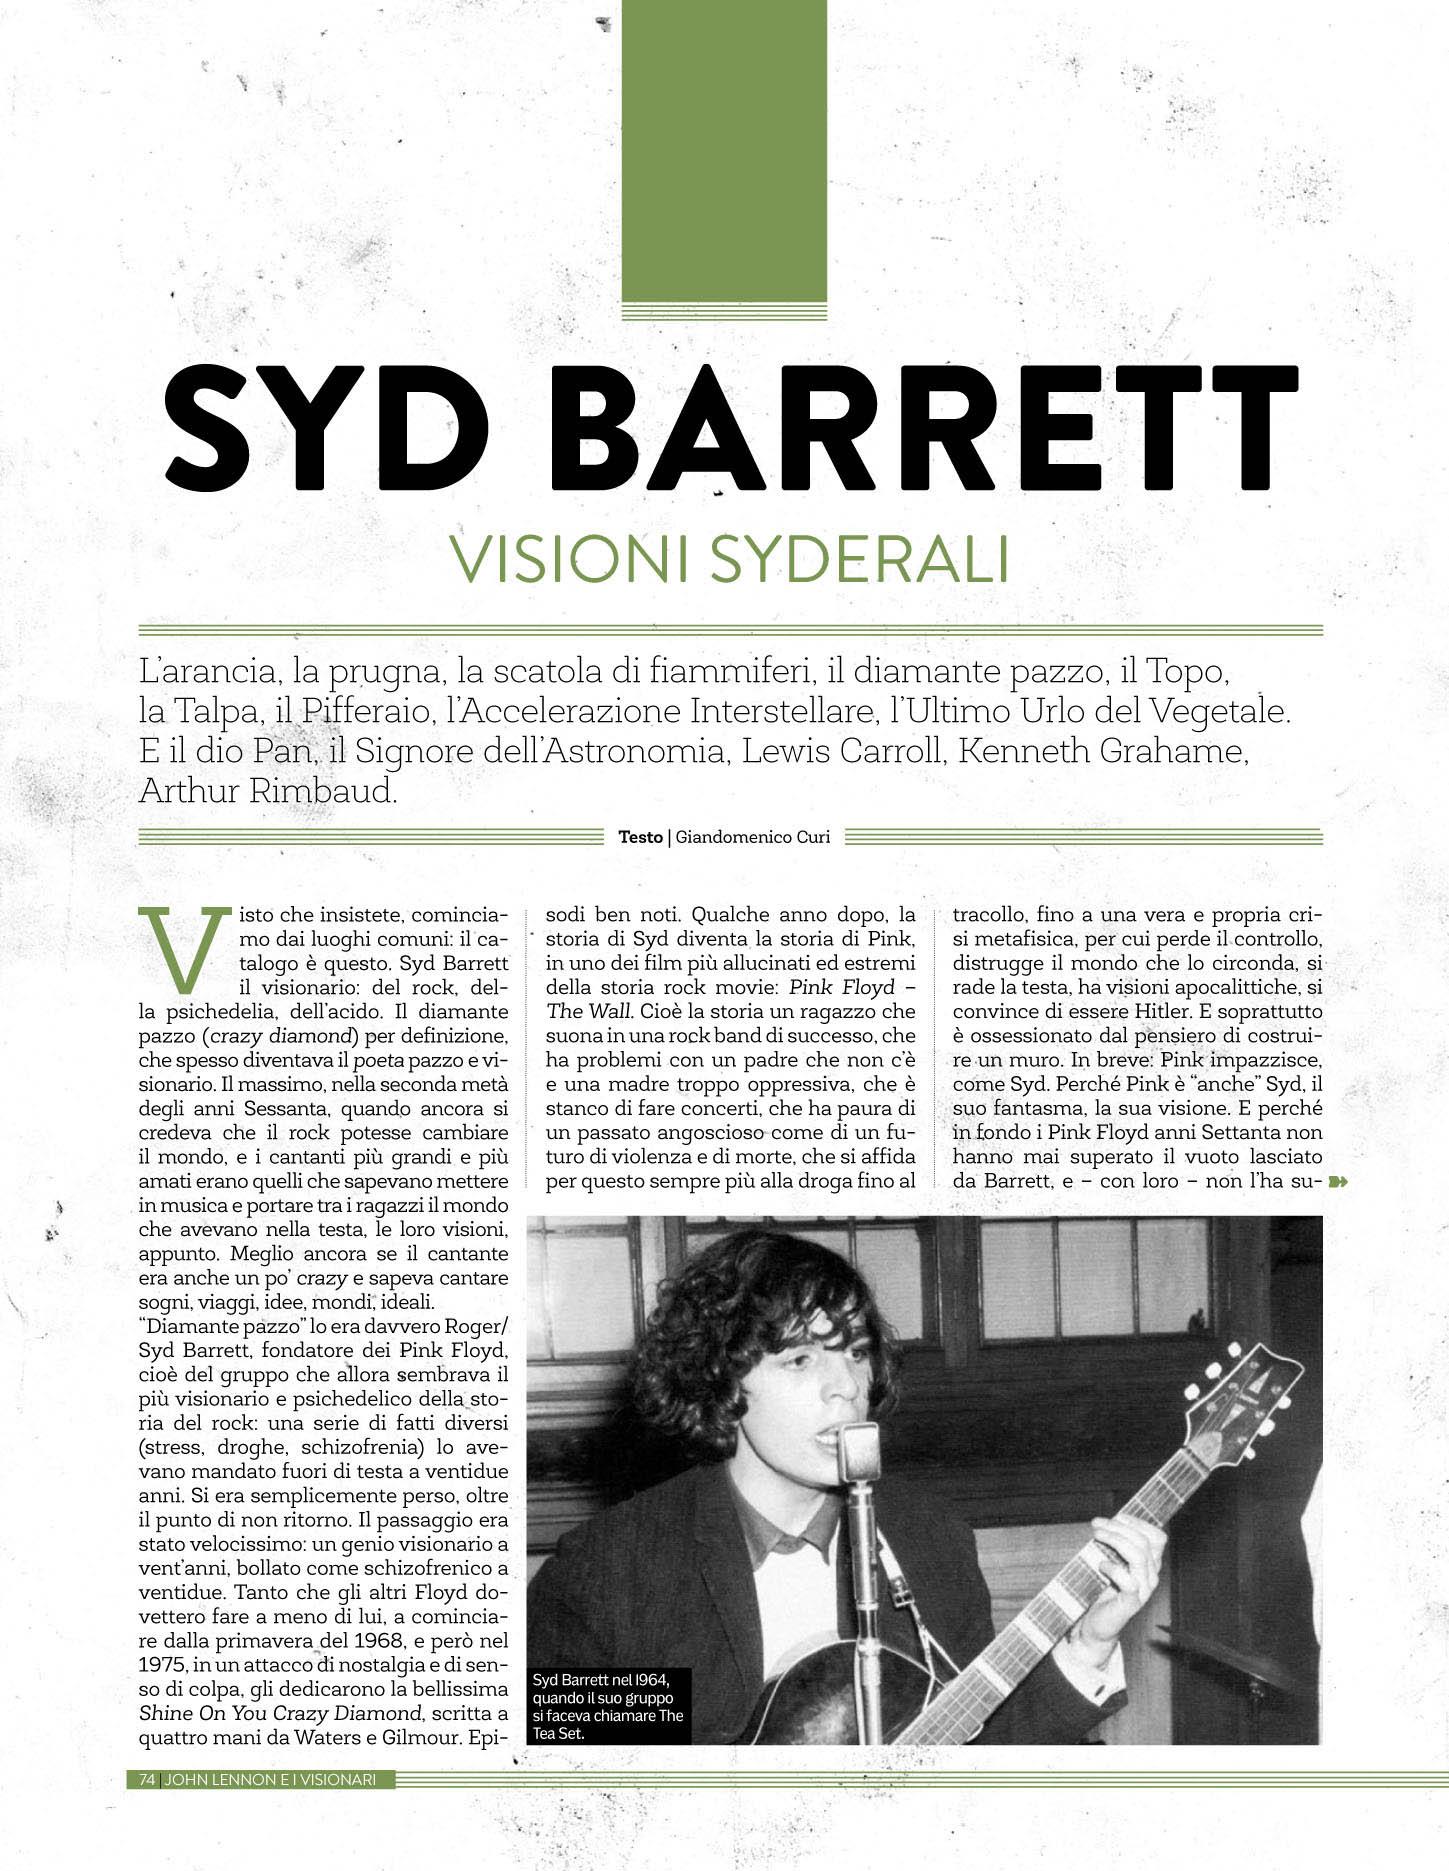 Classic Rock Monografie N5 2017-05-06 SBarrett 01.jpg